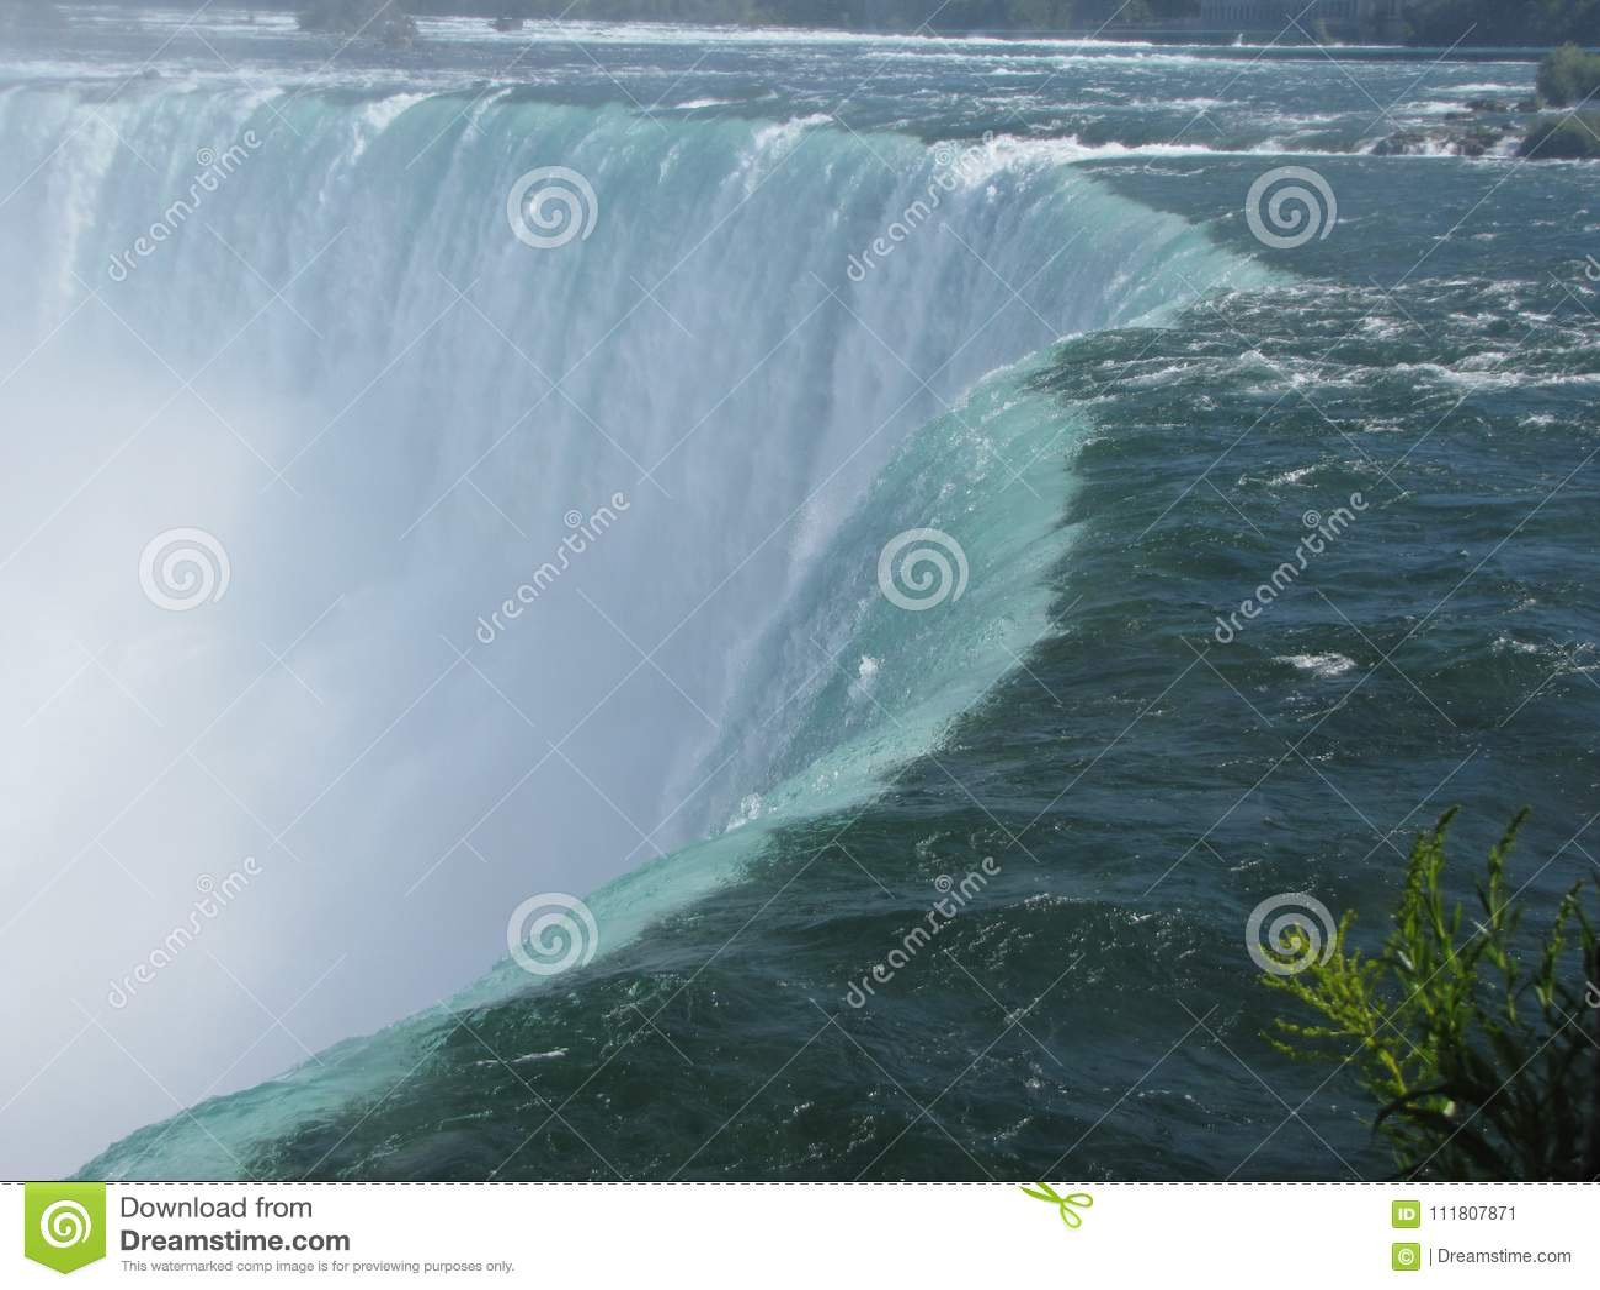 Views Of The Niagara River And The Famous Niagara Falls In